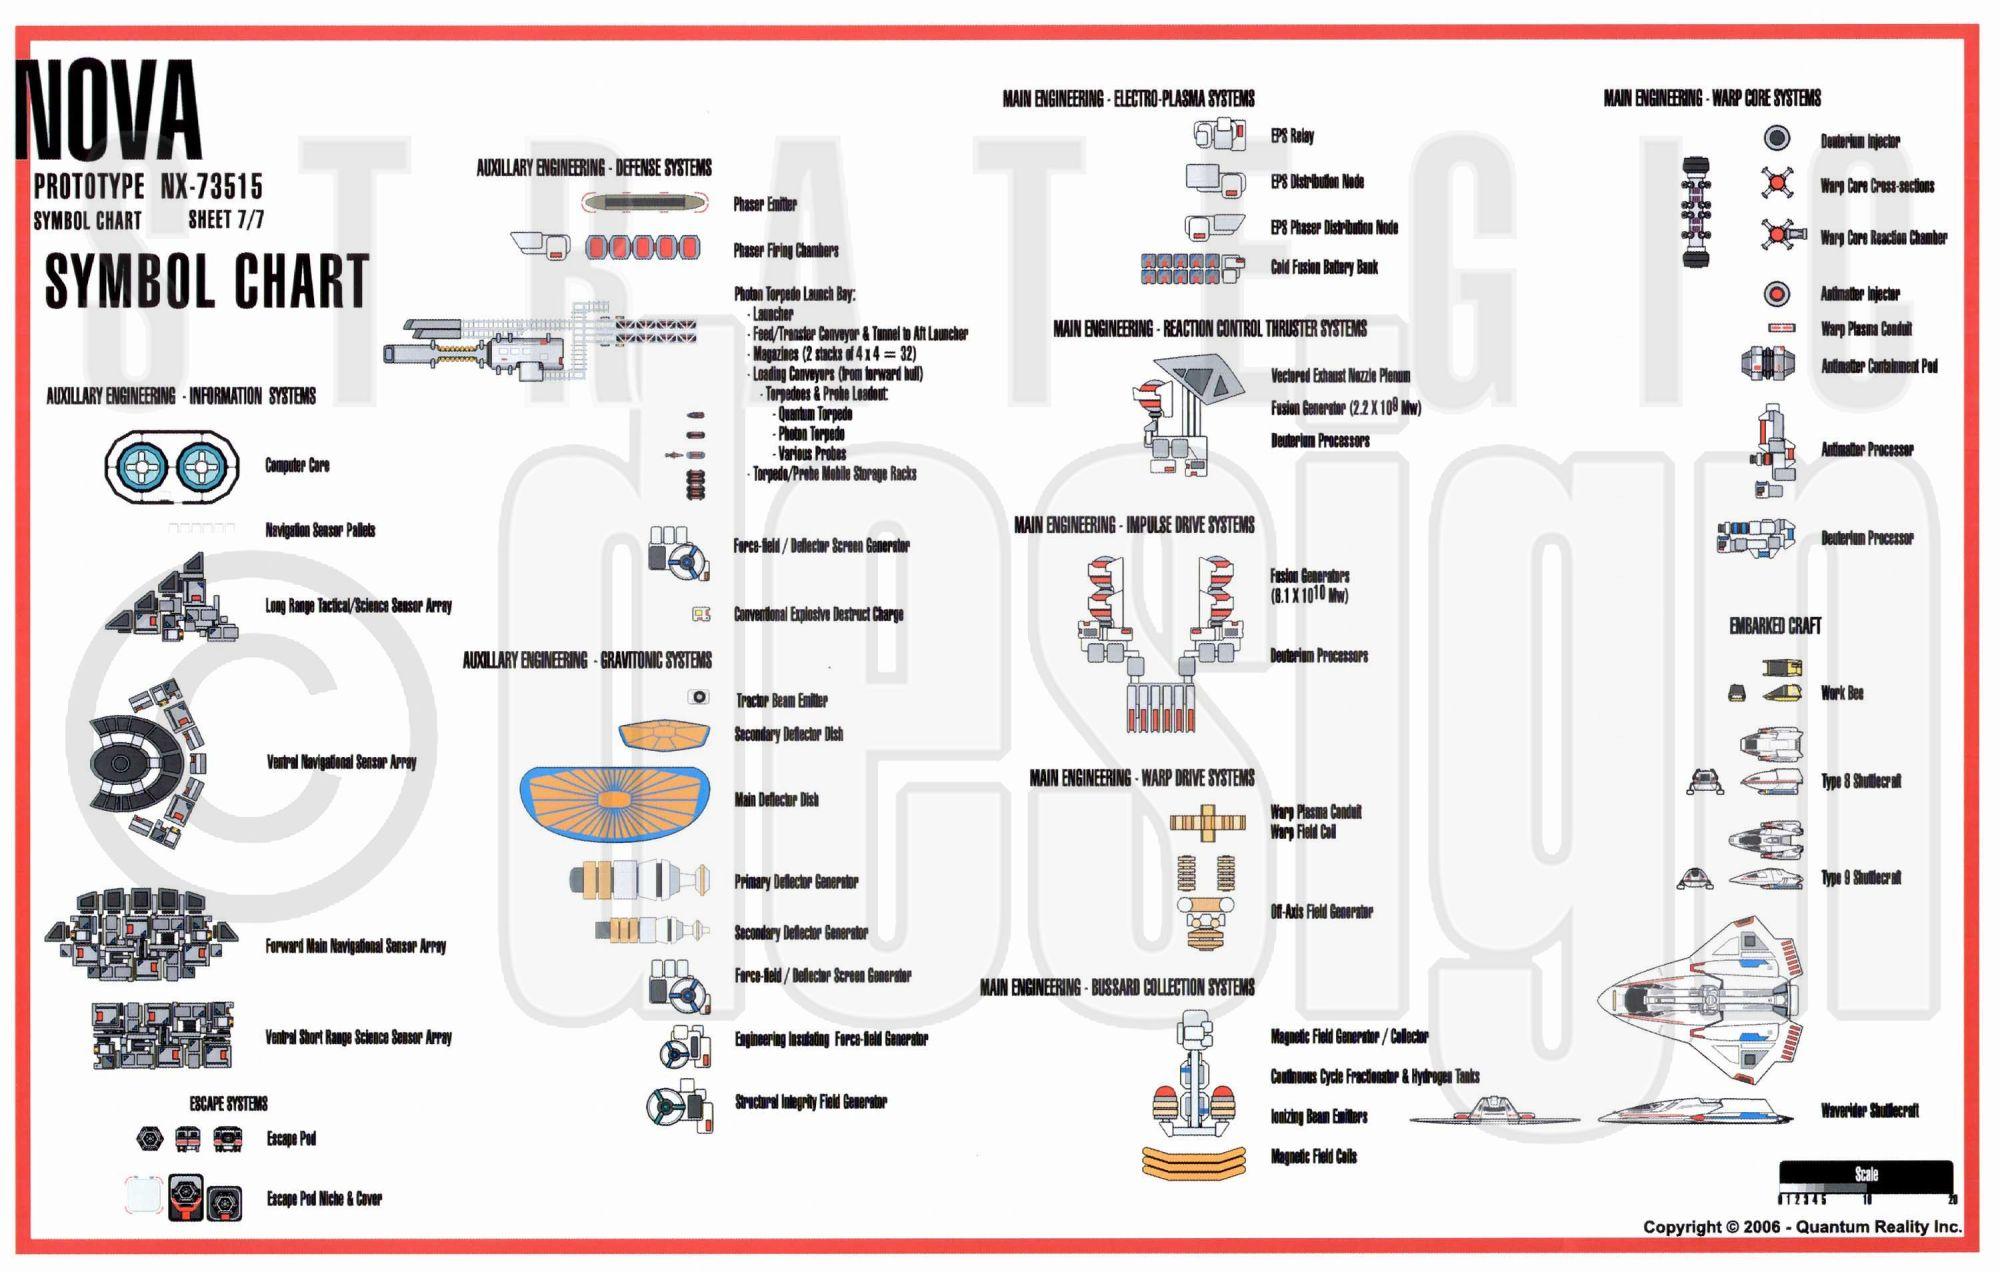 hight resolution of floor plan symbols chart star trek blueprints u s s nova nx 73515